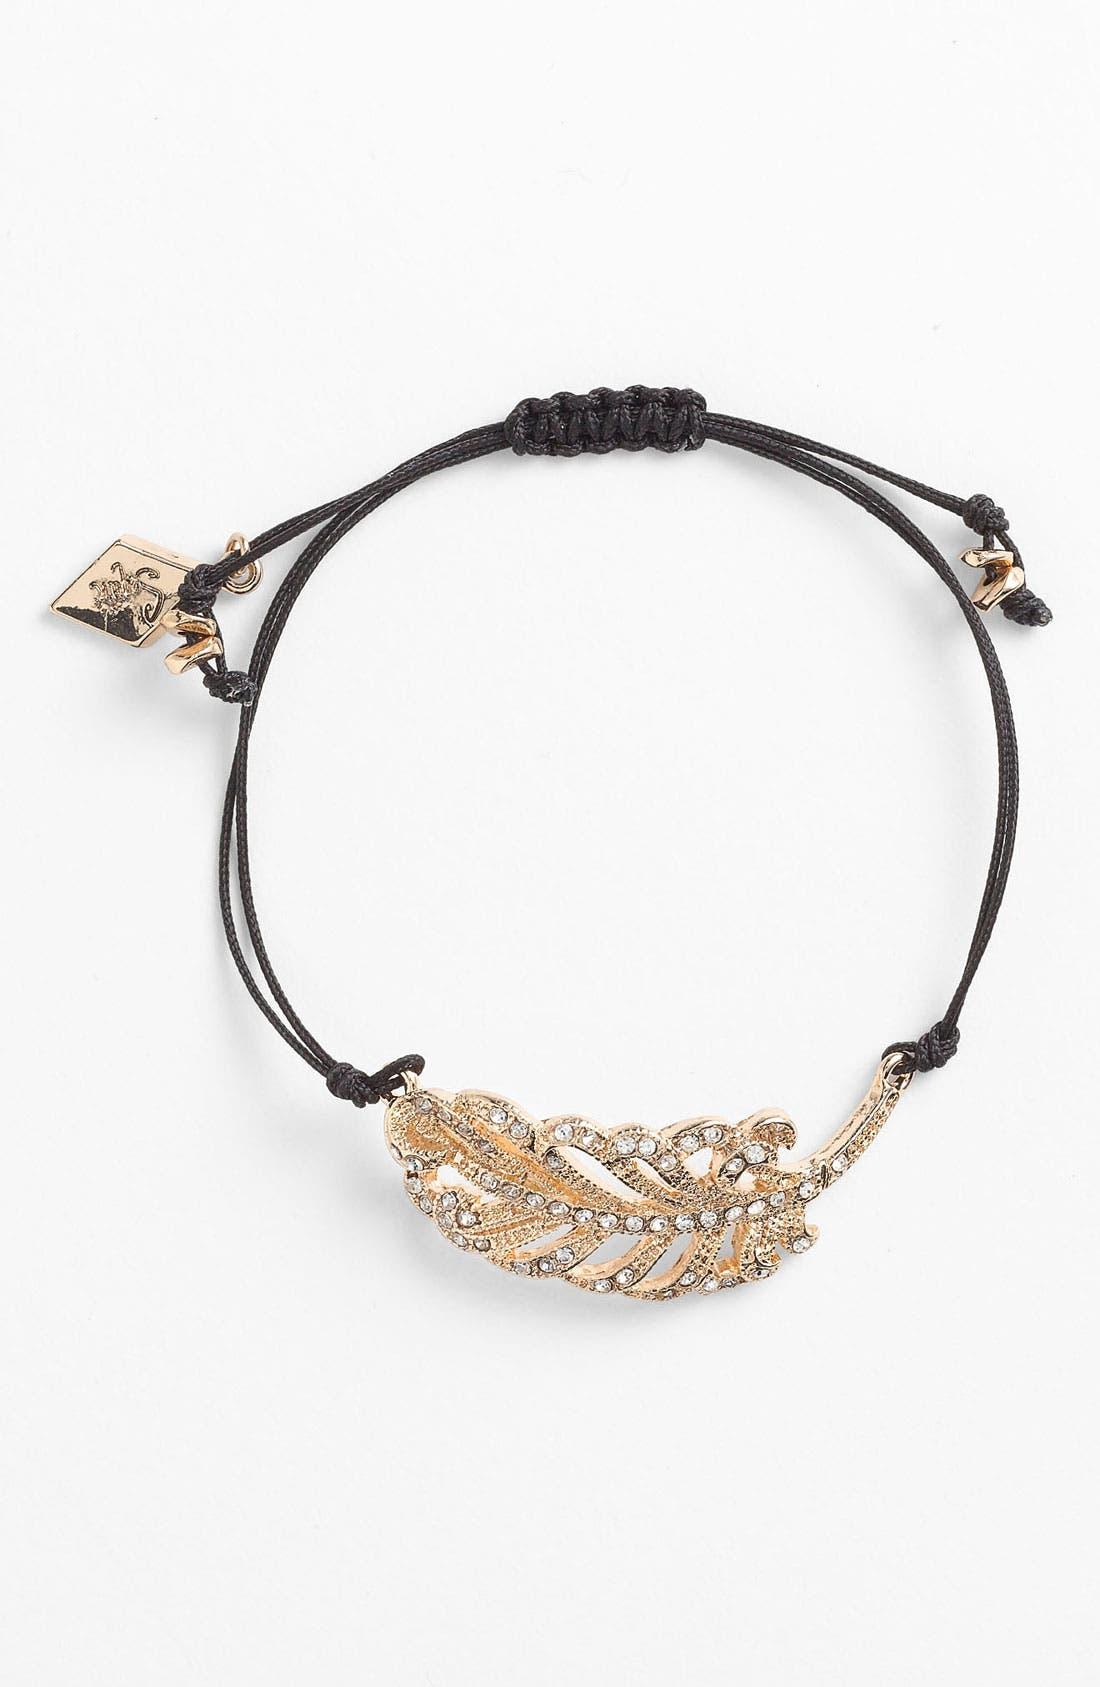 Alternate Image 1 Selected - Sequin 'Deco' Friendship Bracelet